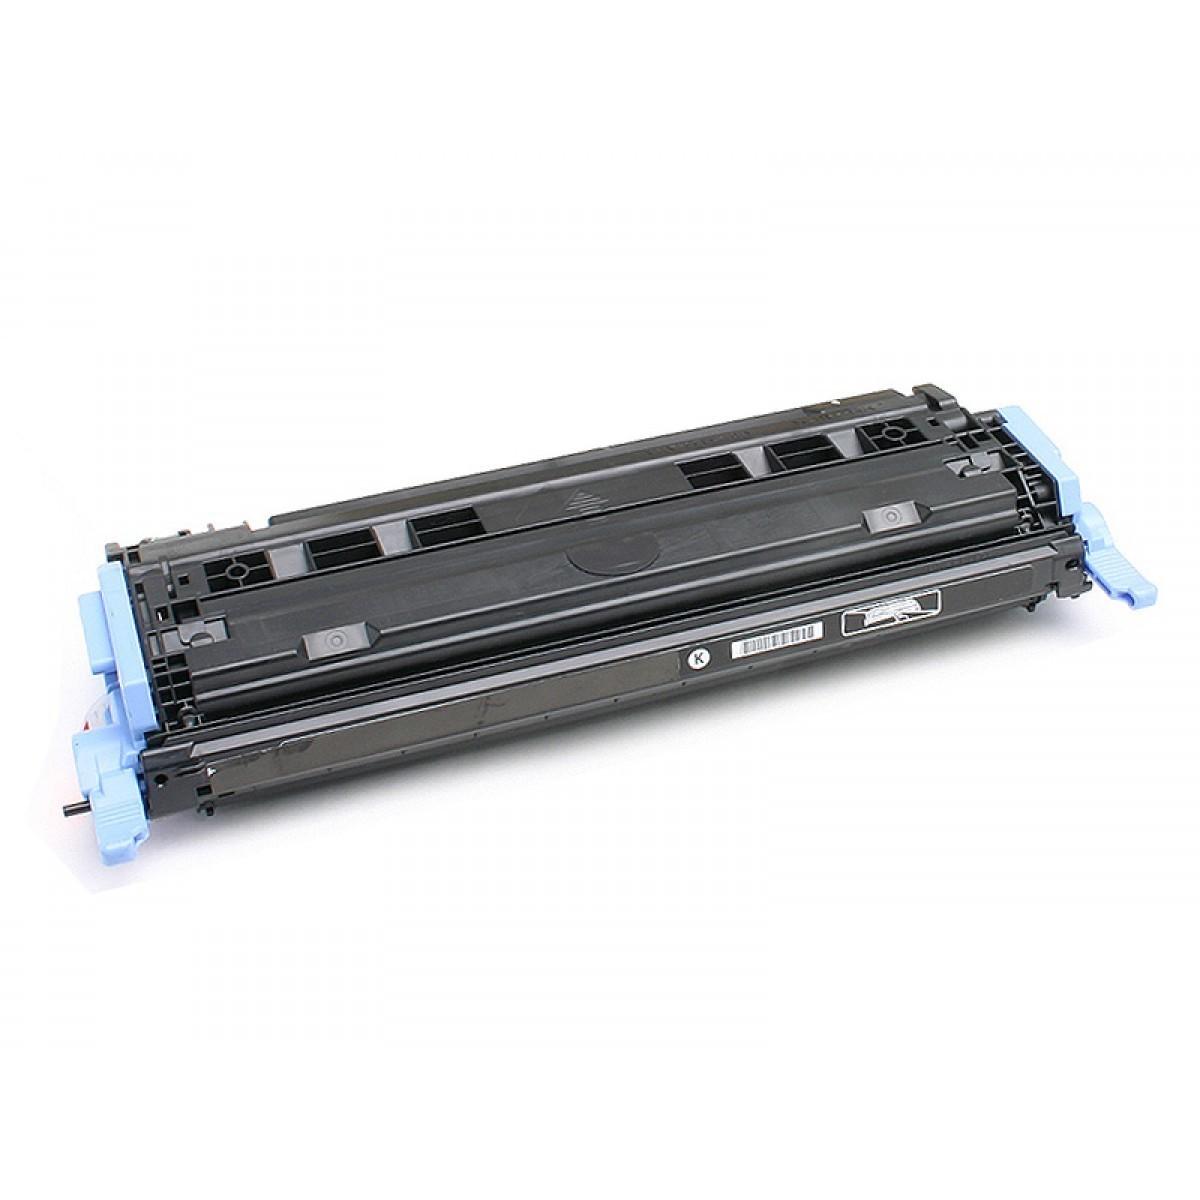 CART. TONER HP 2600 BLACK (1600/2600)